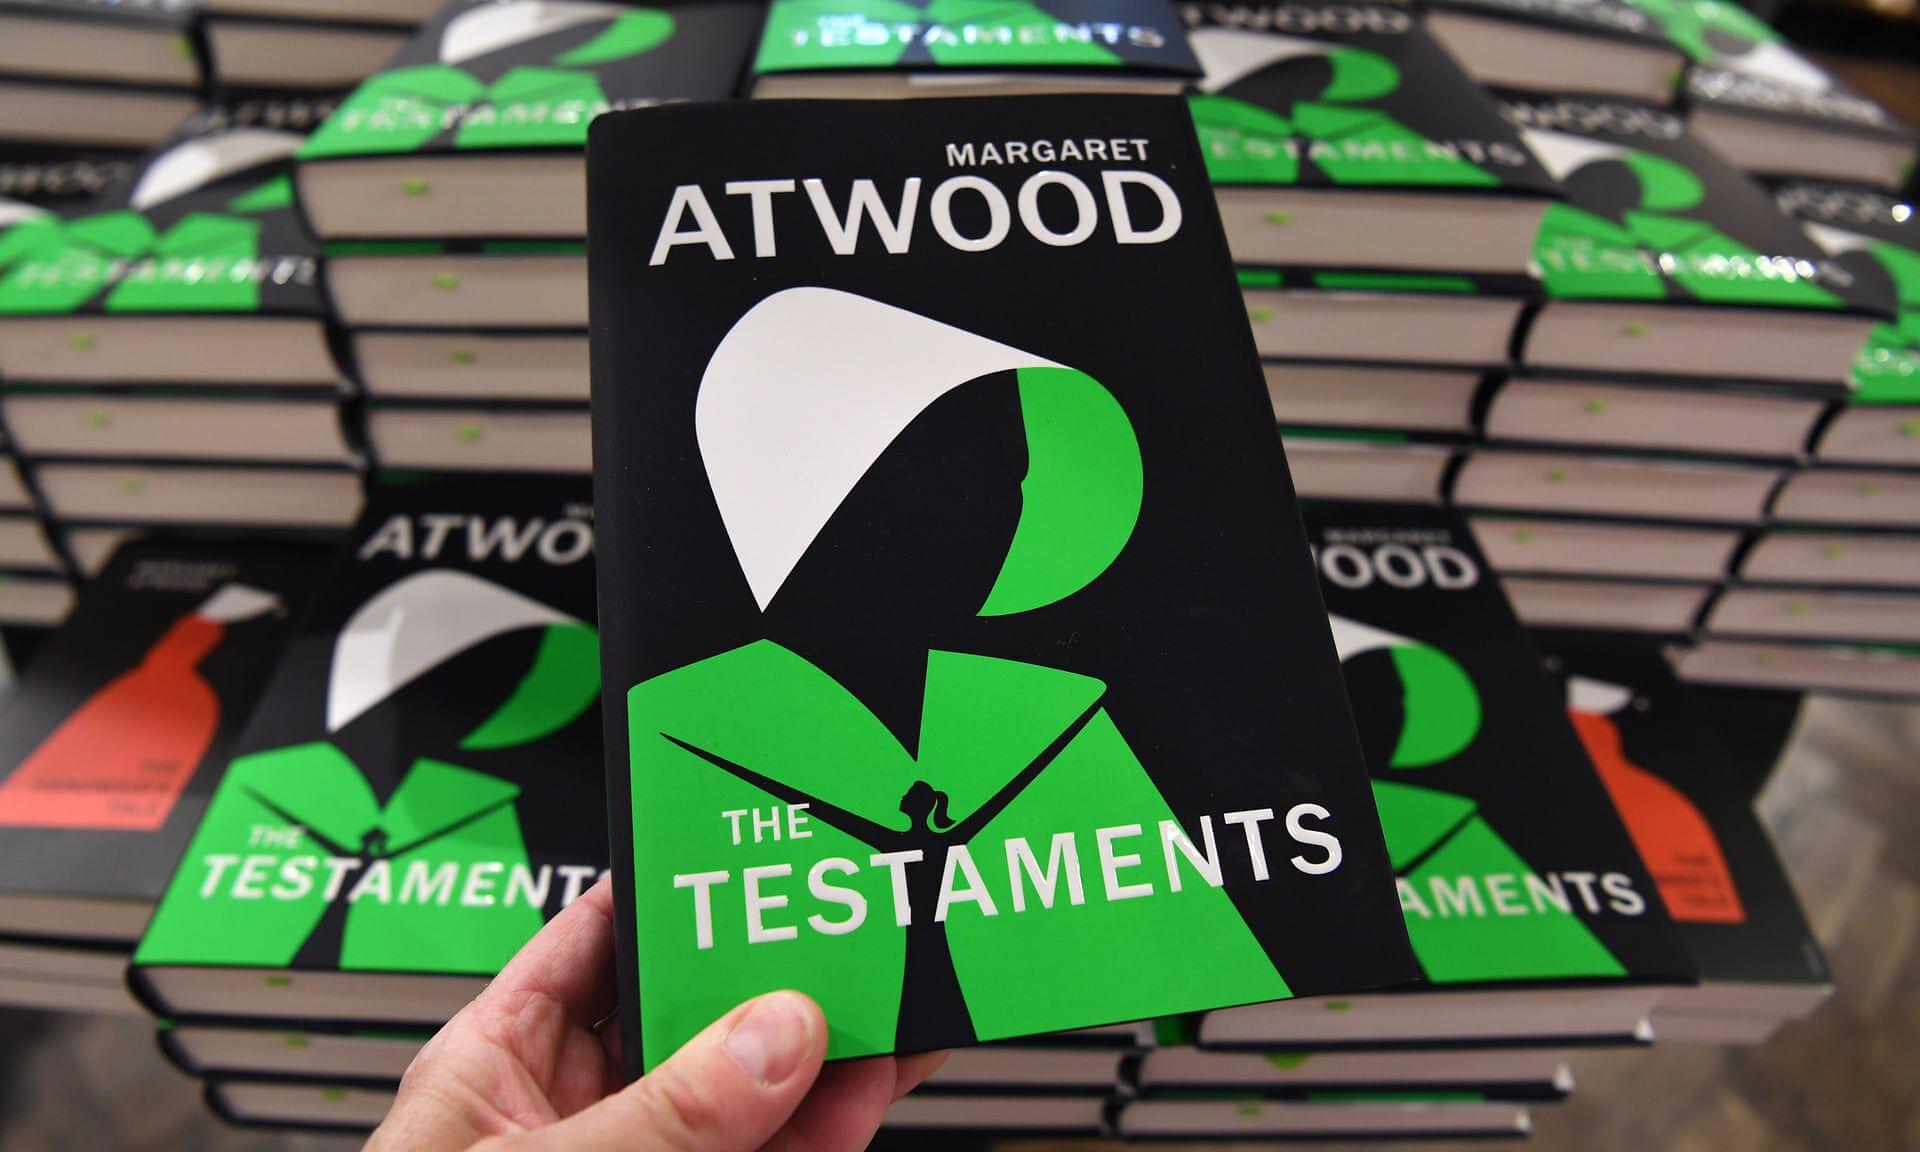 margaret atwood a testamentumok